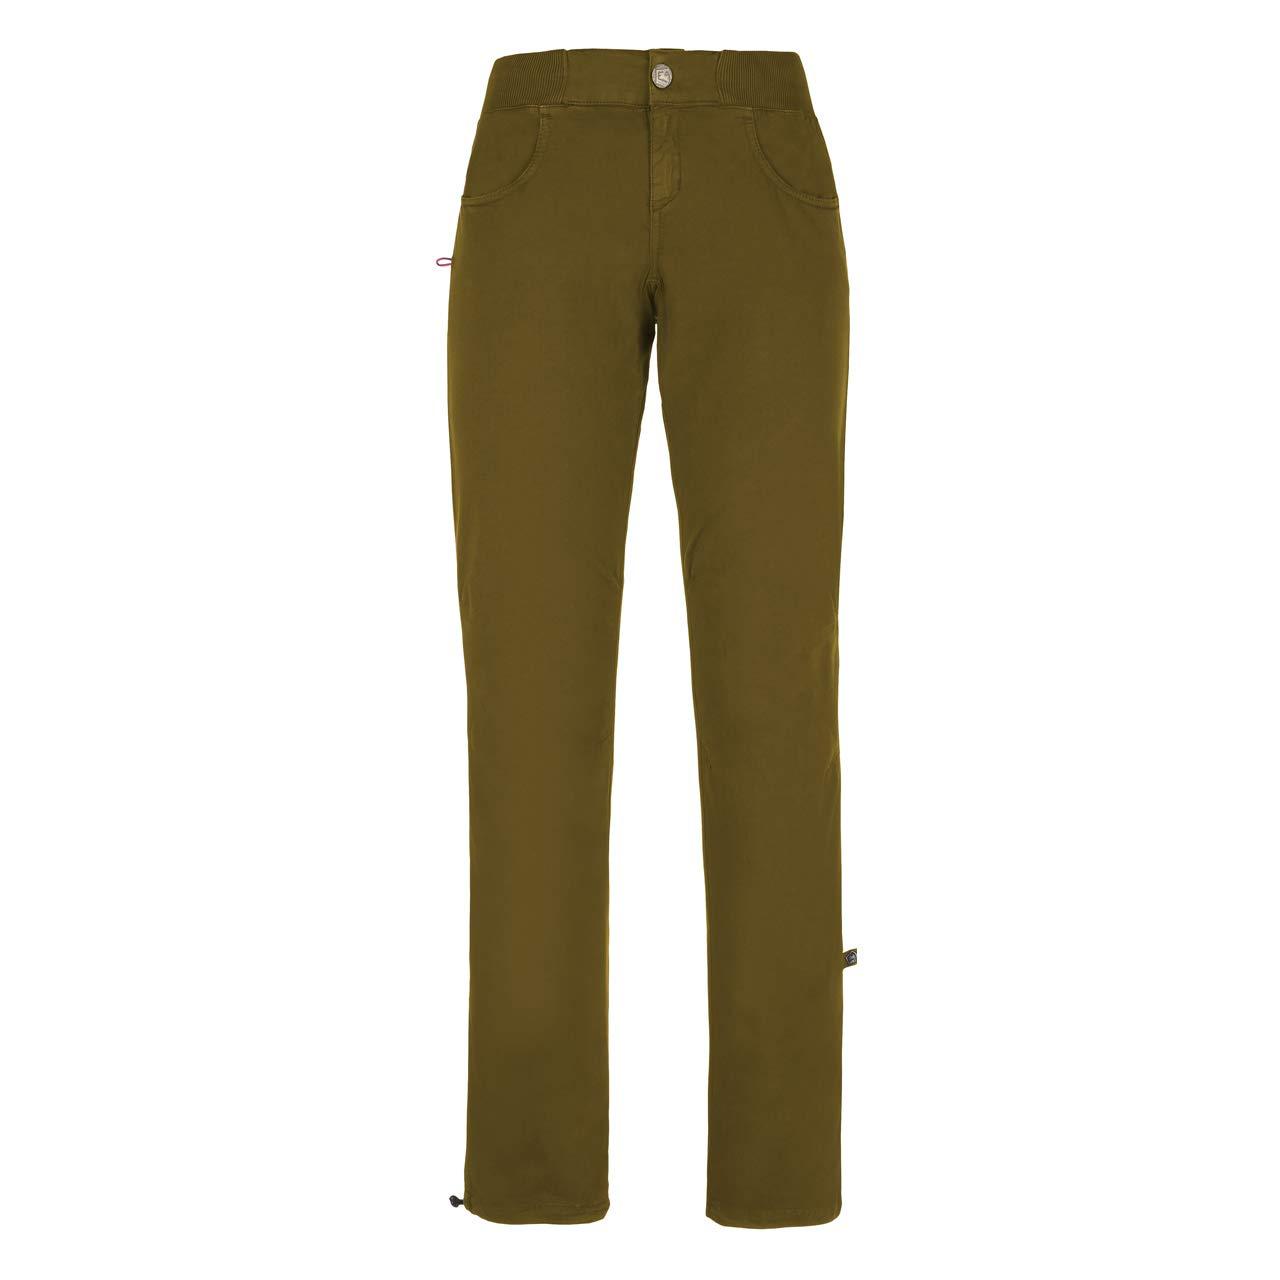 Olive XL E9 FFaibleer - Pantalon Femme - Olive 2019